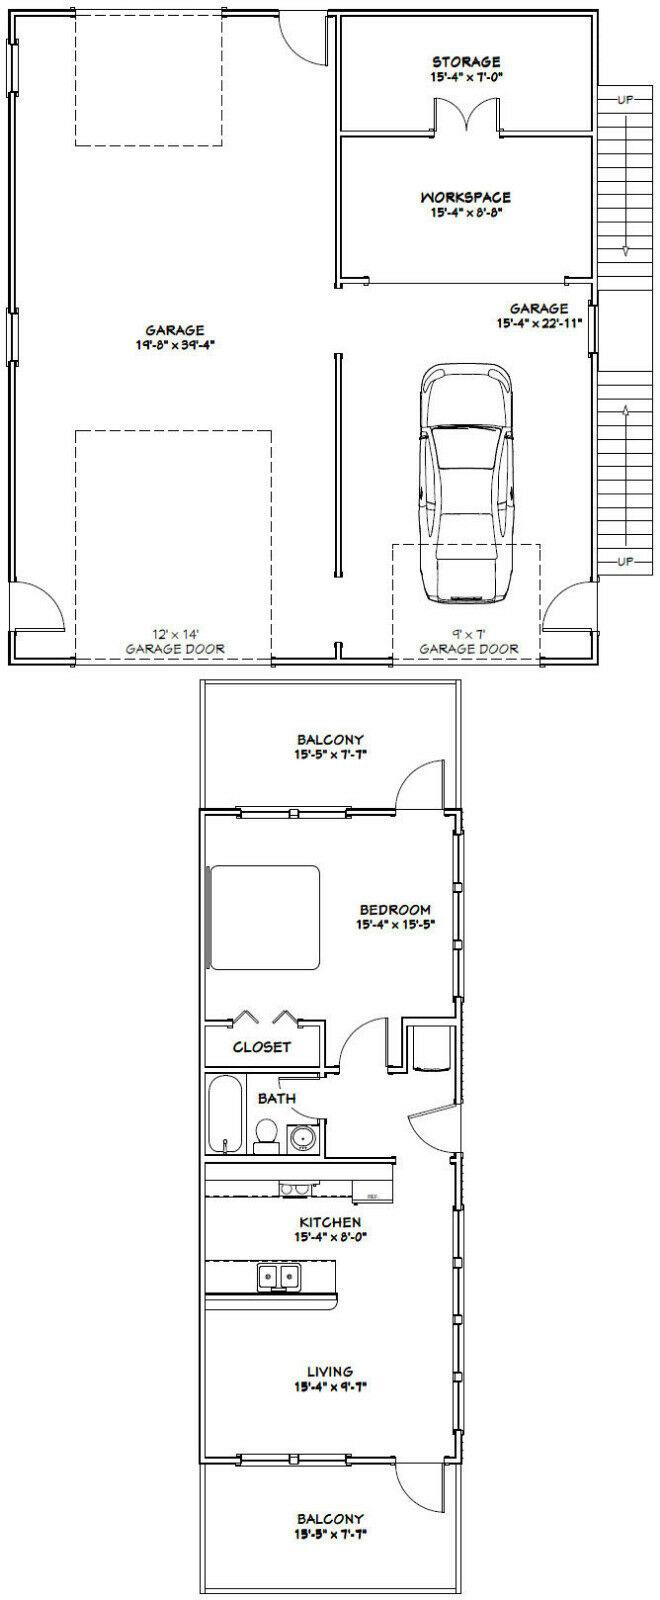 36x40 Apartment with 1-Car 1-RV Garage -- PDF Floor Plan ...